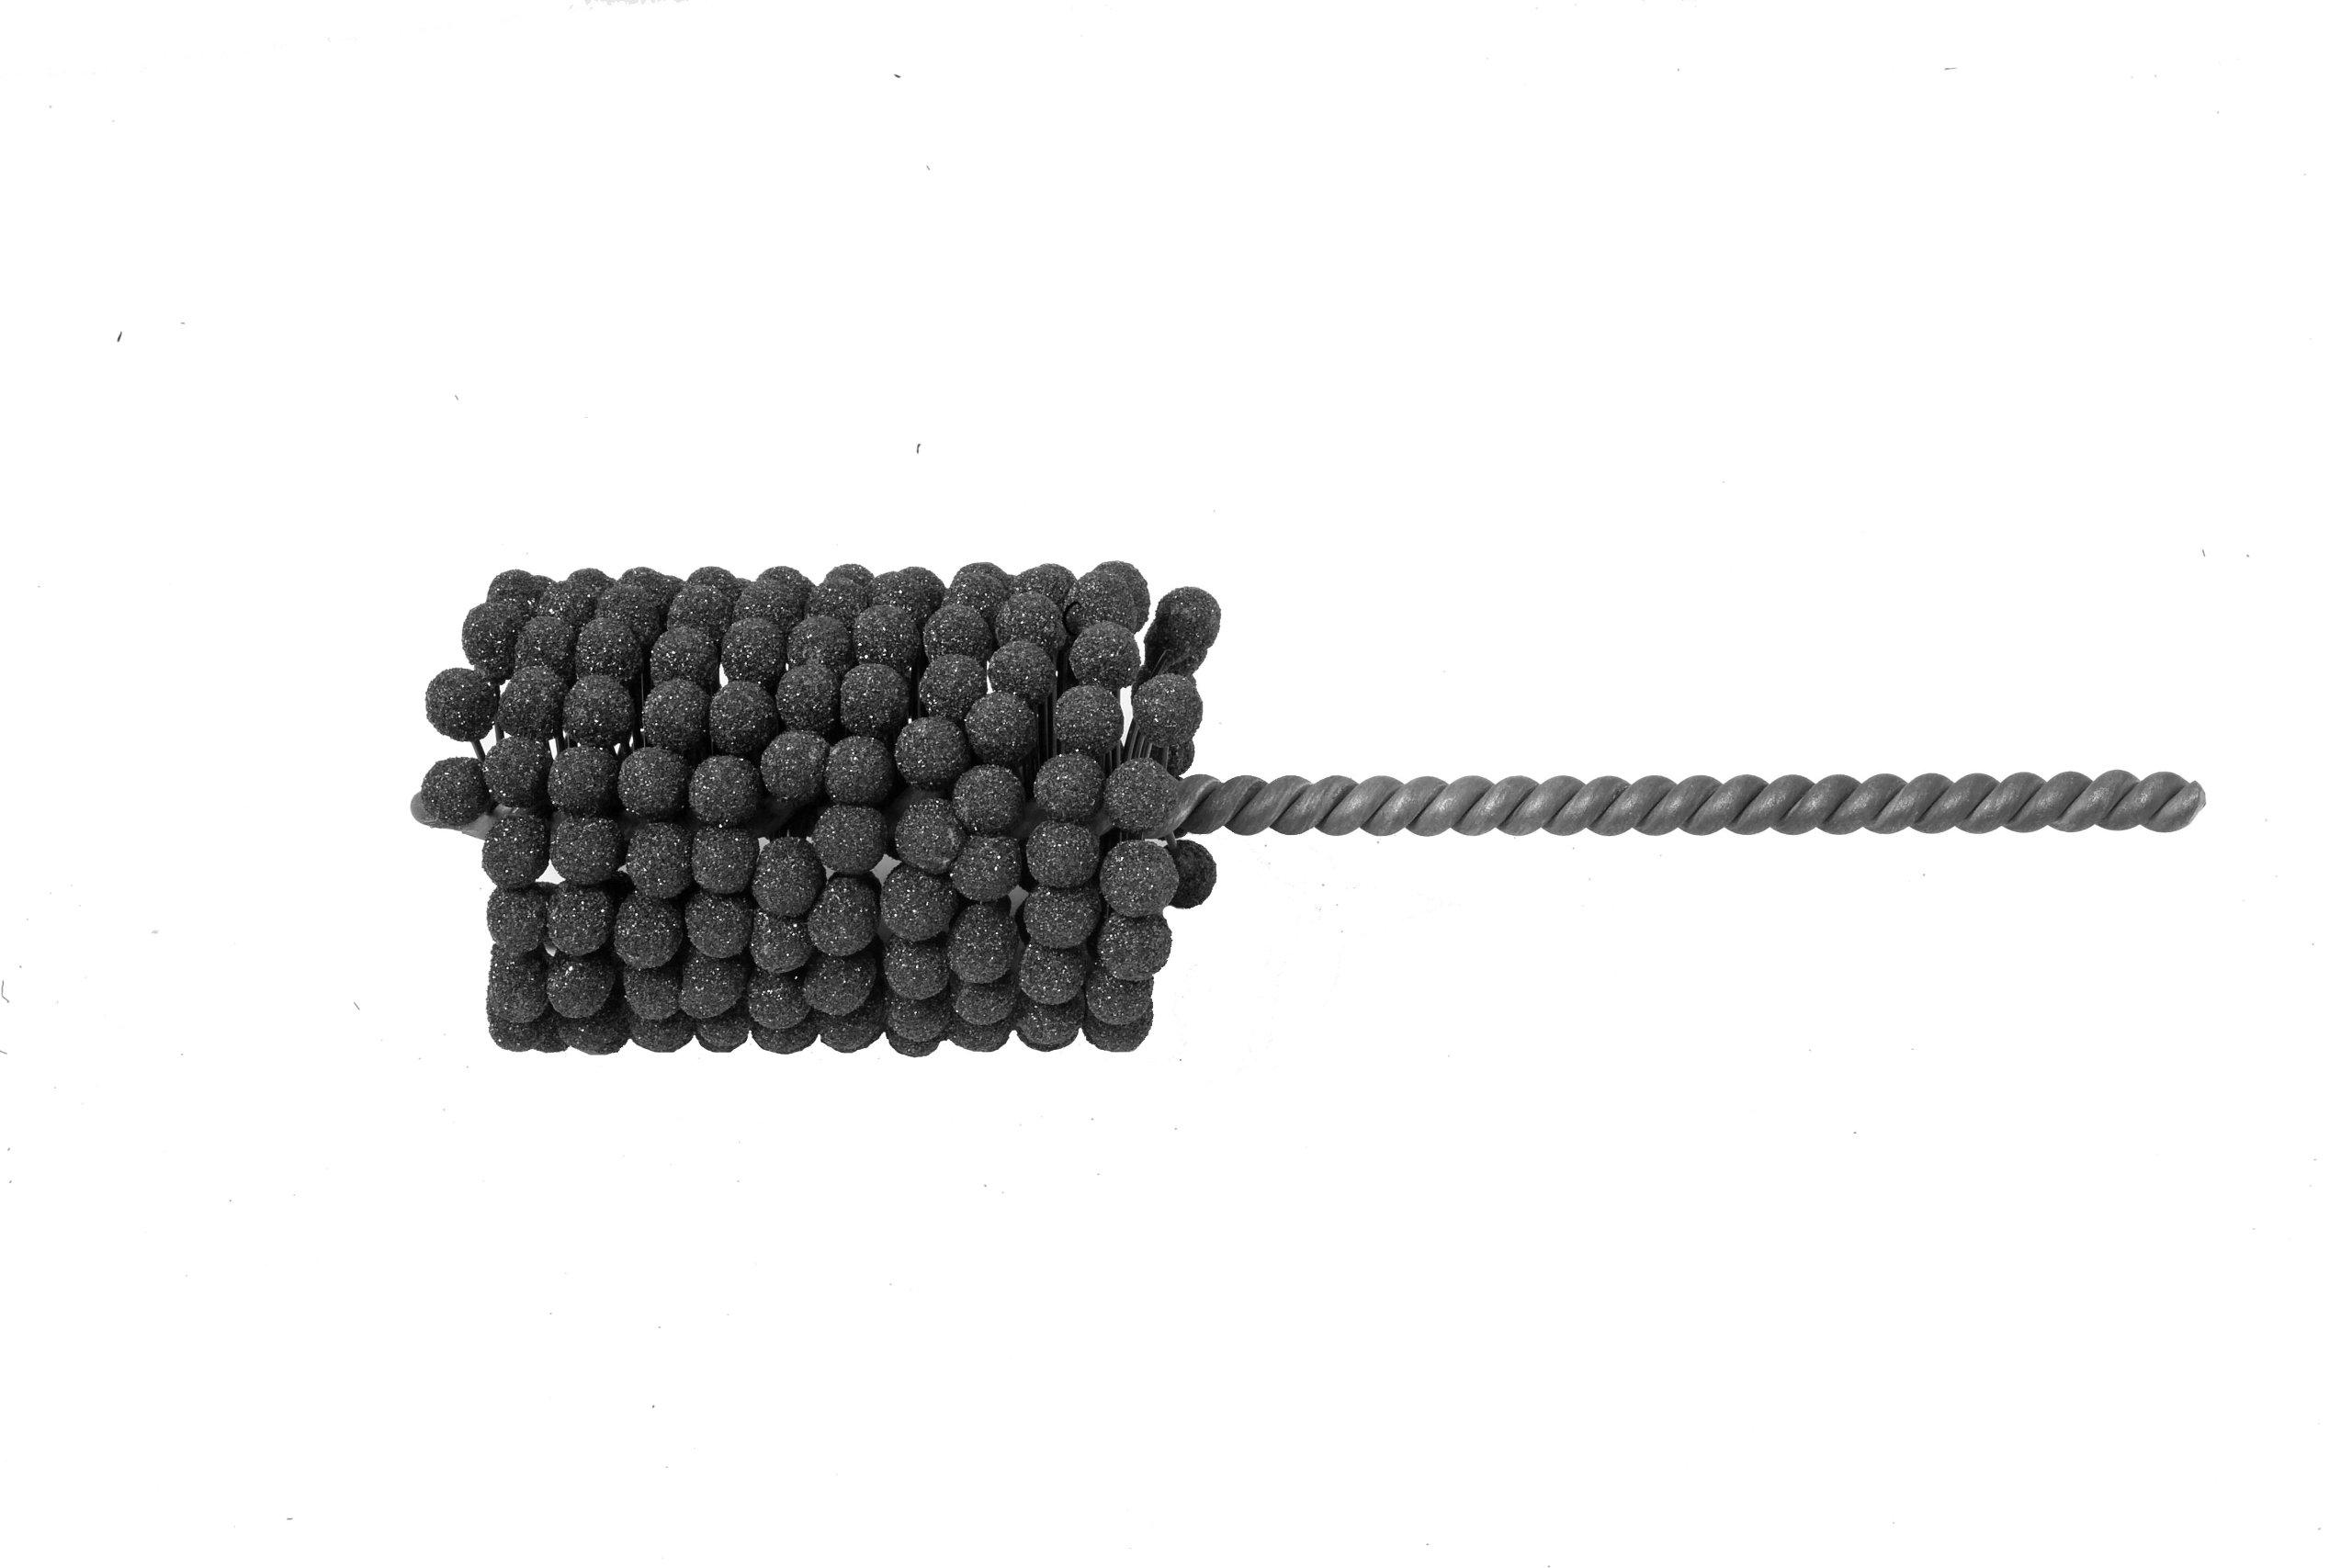 Osborn 77378SP NovoFlex Honing Tool, Silicon Carbide, 1200 rpm, 2.5'' Hole Diameter, 2.75'' Item Diameter, 0.25'' Shank Diameter